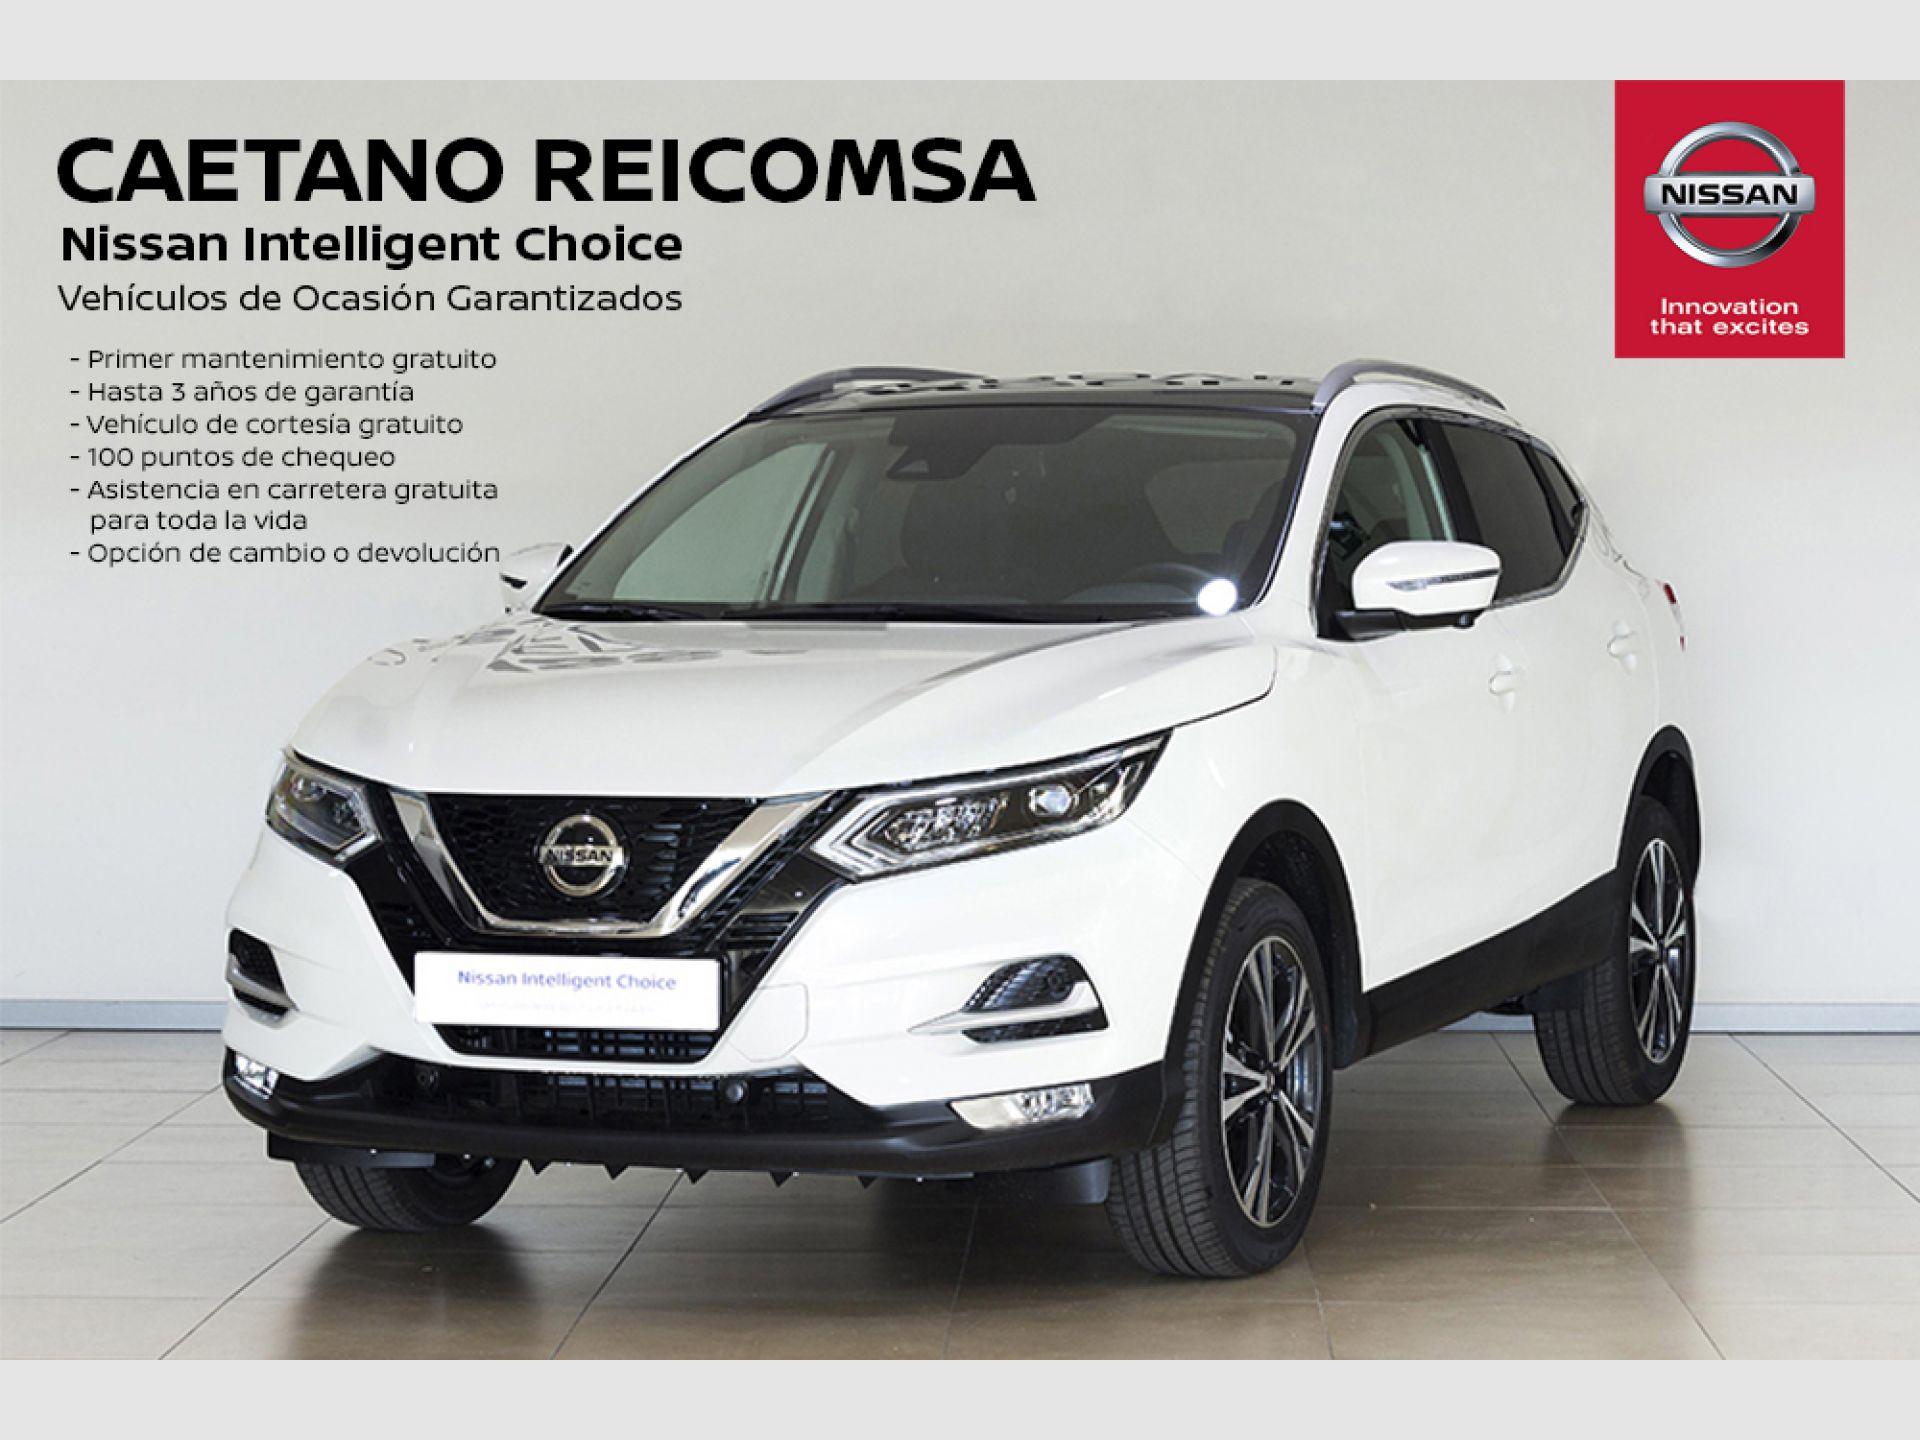 Nissan Qashqai DIG-T 103 kW (140 CV) E6D N-CONNECTA + LED segunda mano Madrid